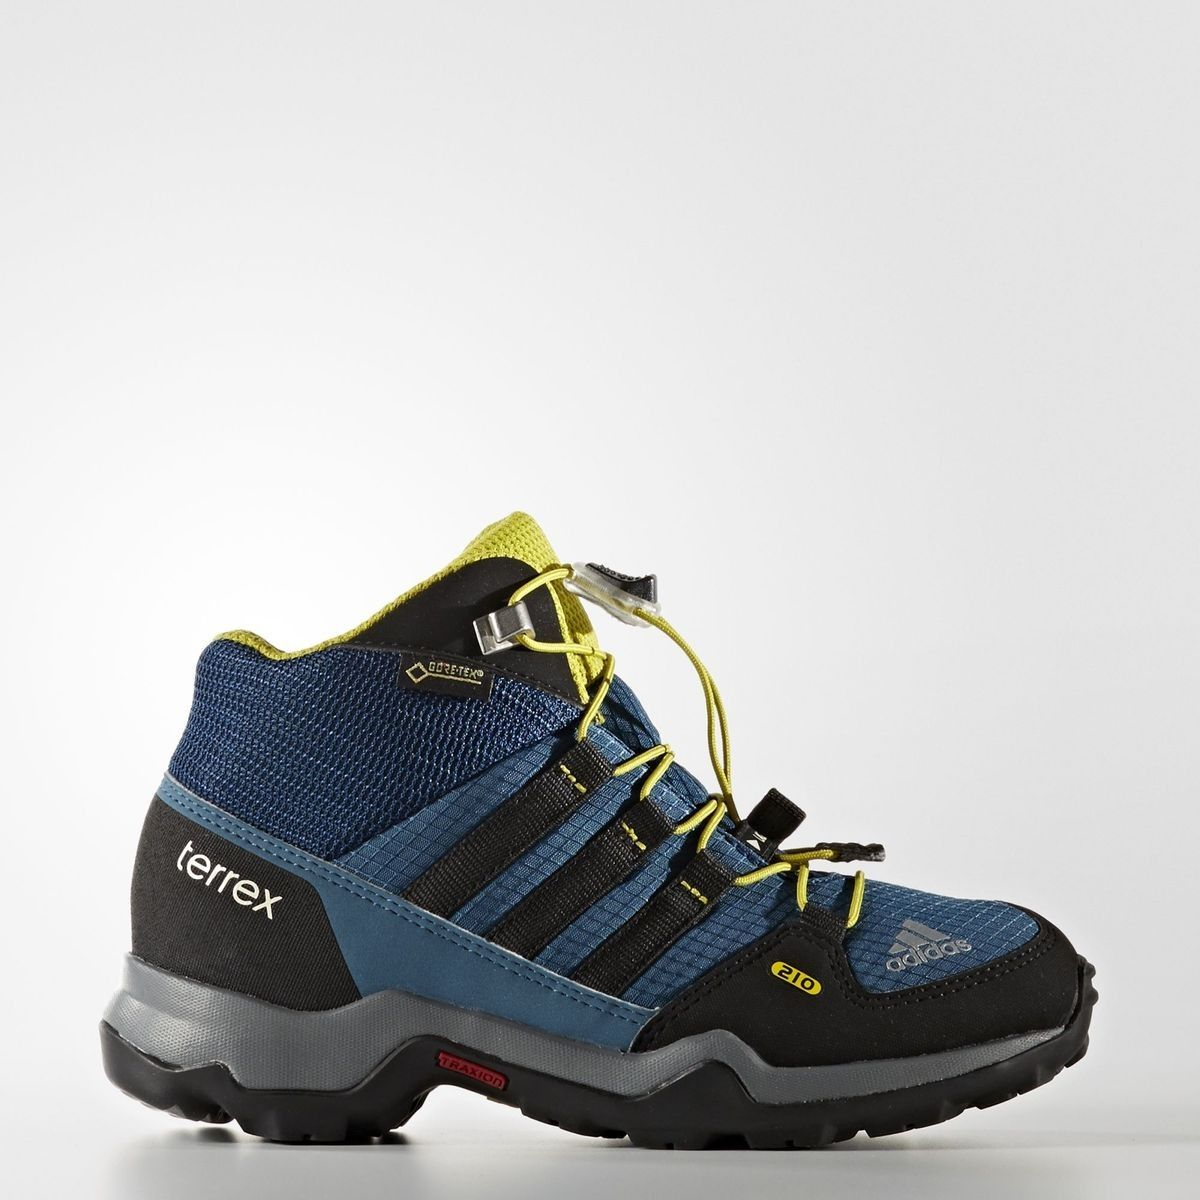 best cheap 8f286 0b78f Chaussure De Marche Terrex Mid Gtx K Af6141 - Taille   35 36 32 33 40 38 34